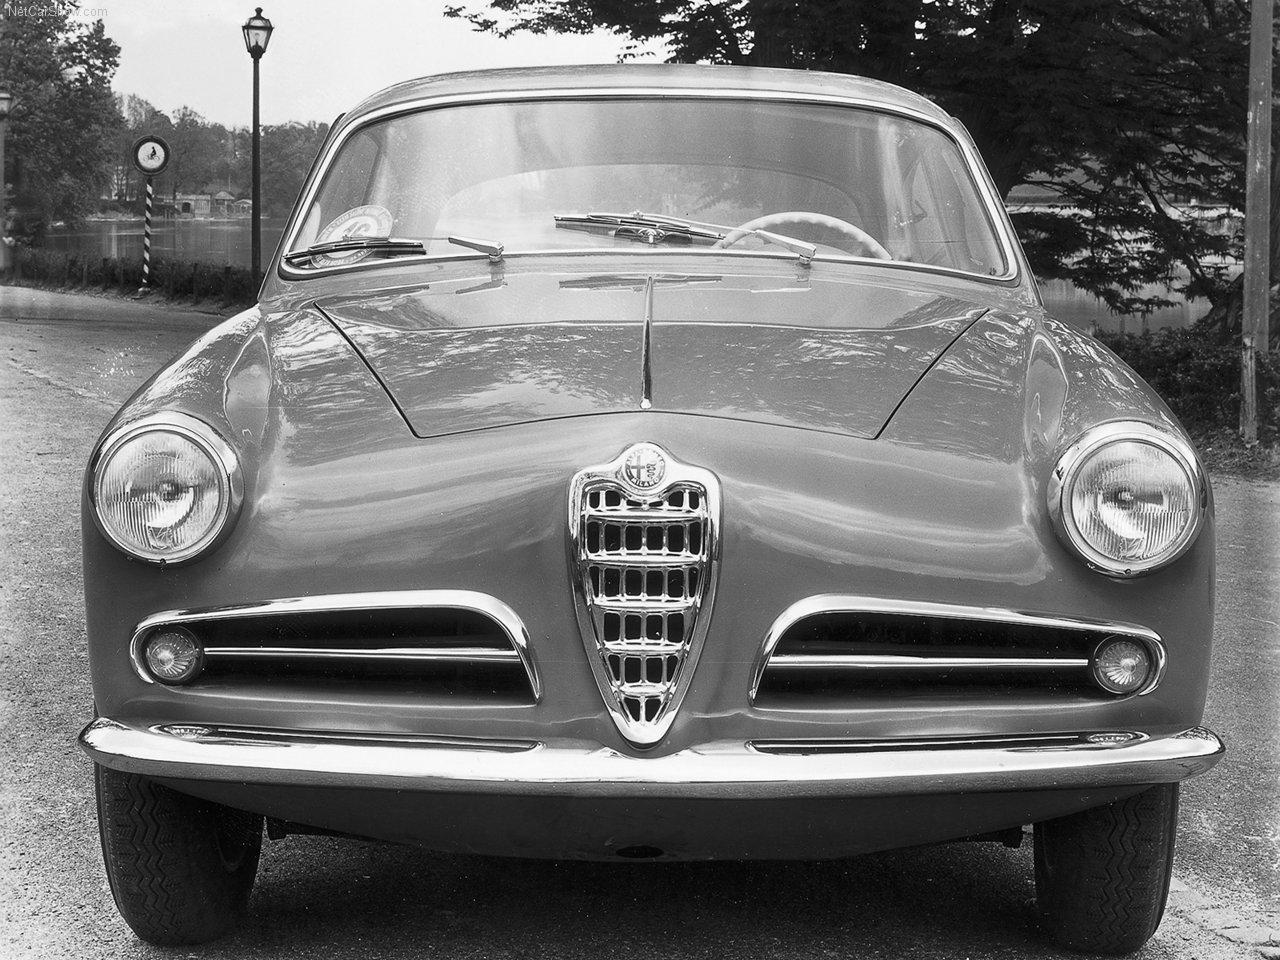 Alfa Romeo Giulietta Sprint 1954 Alfa_Romeo-Giulietta_Sprint-1954-1280-05